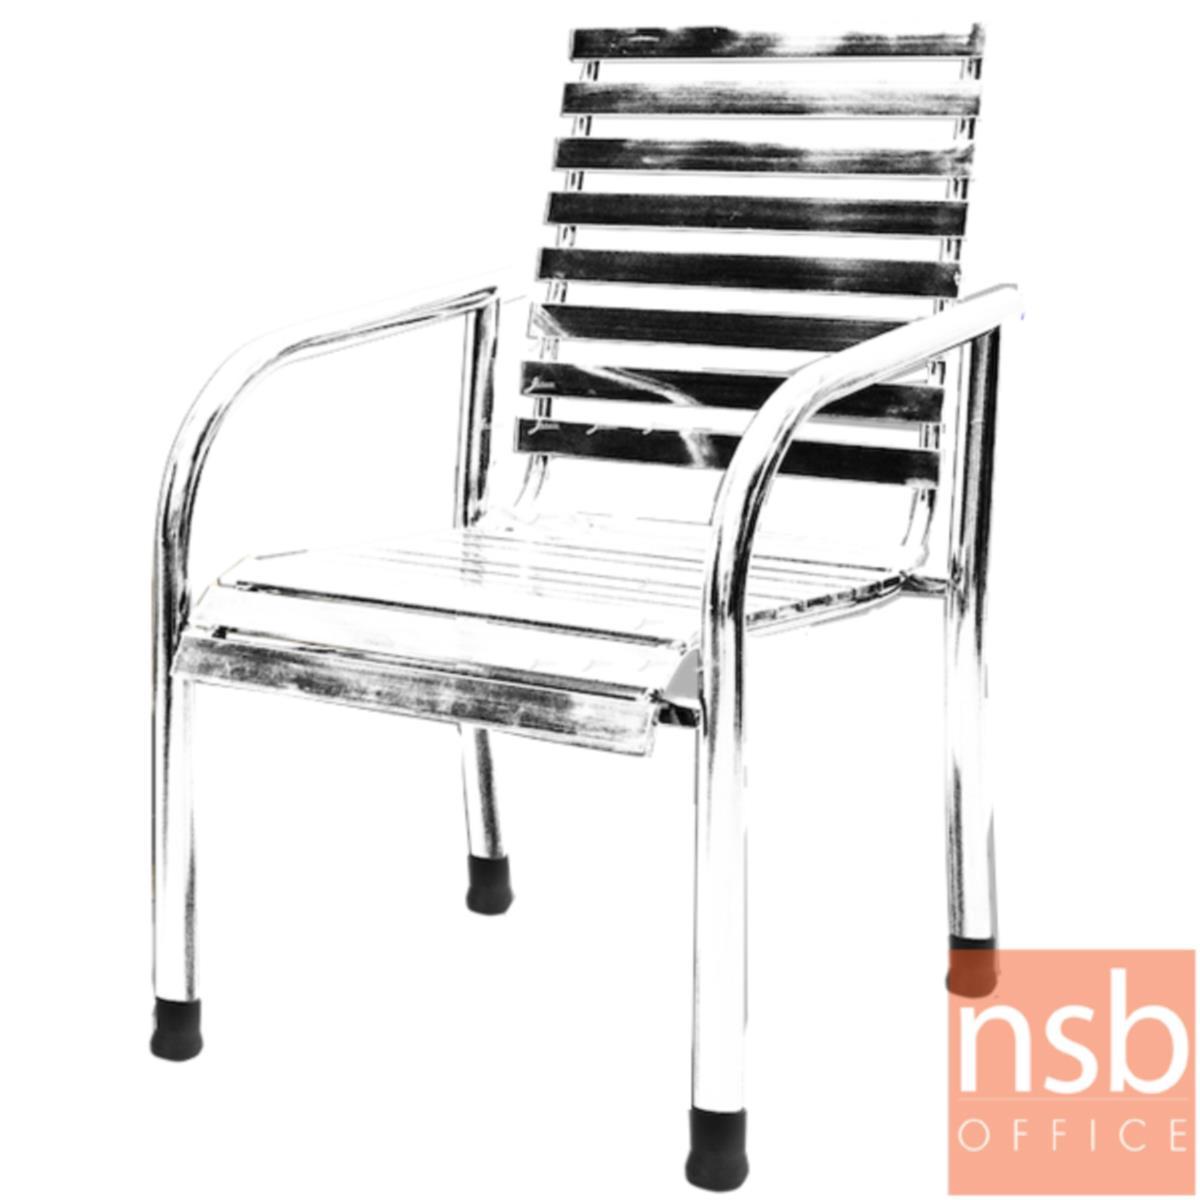 G12A197:เก้าอี้อเนกประสงค์สเตนเลส รุ่น J-KJ-481R มีท้าวแขน (ผลิตจากสเตนเลสกลม+เหลี่ยม)